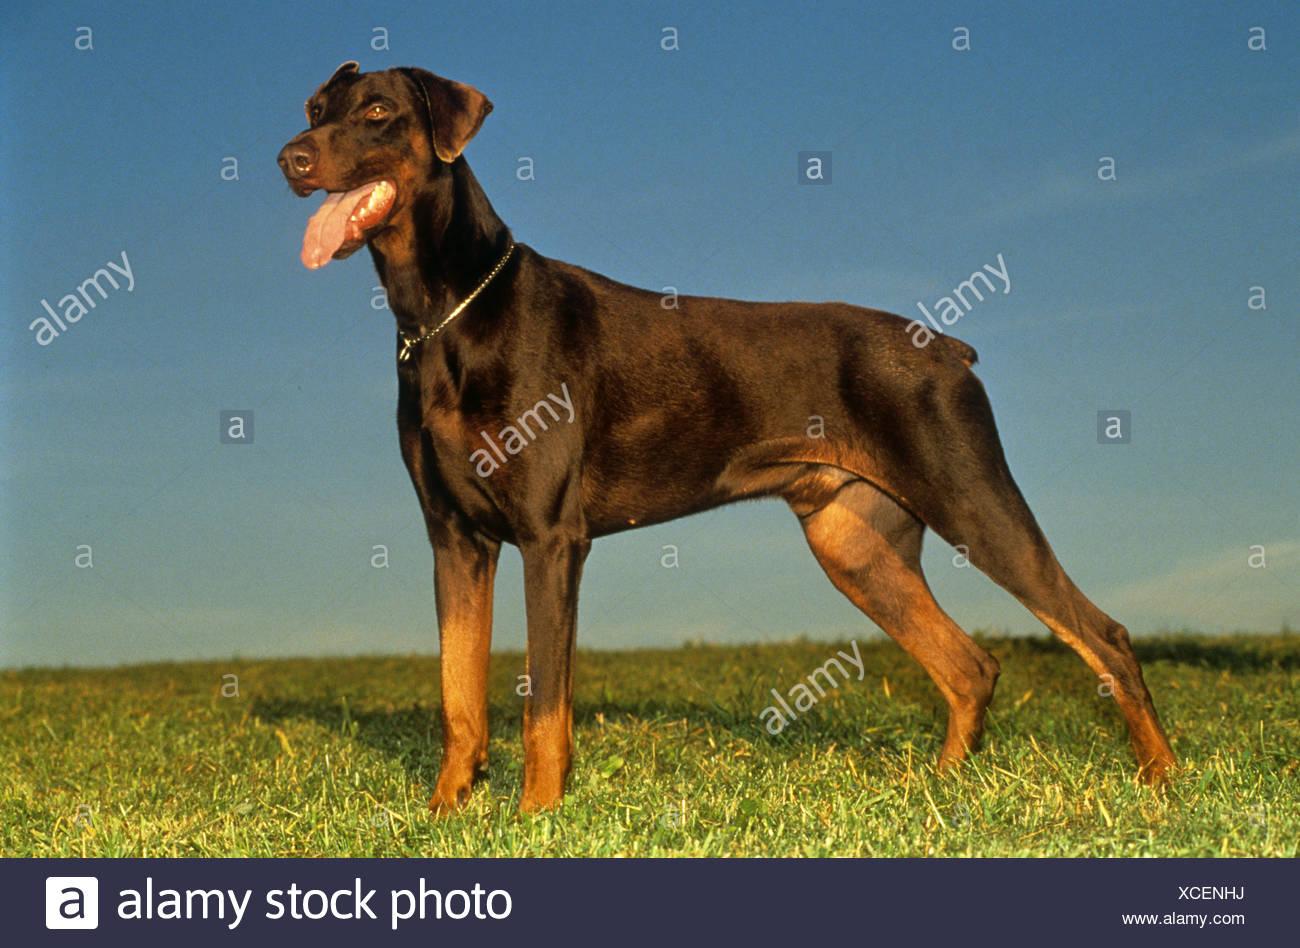 Doberman Pinscher dog non docked - standing on meadow - Stock Image